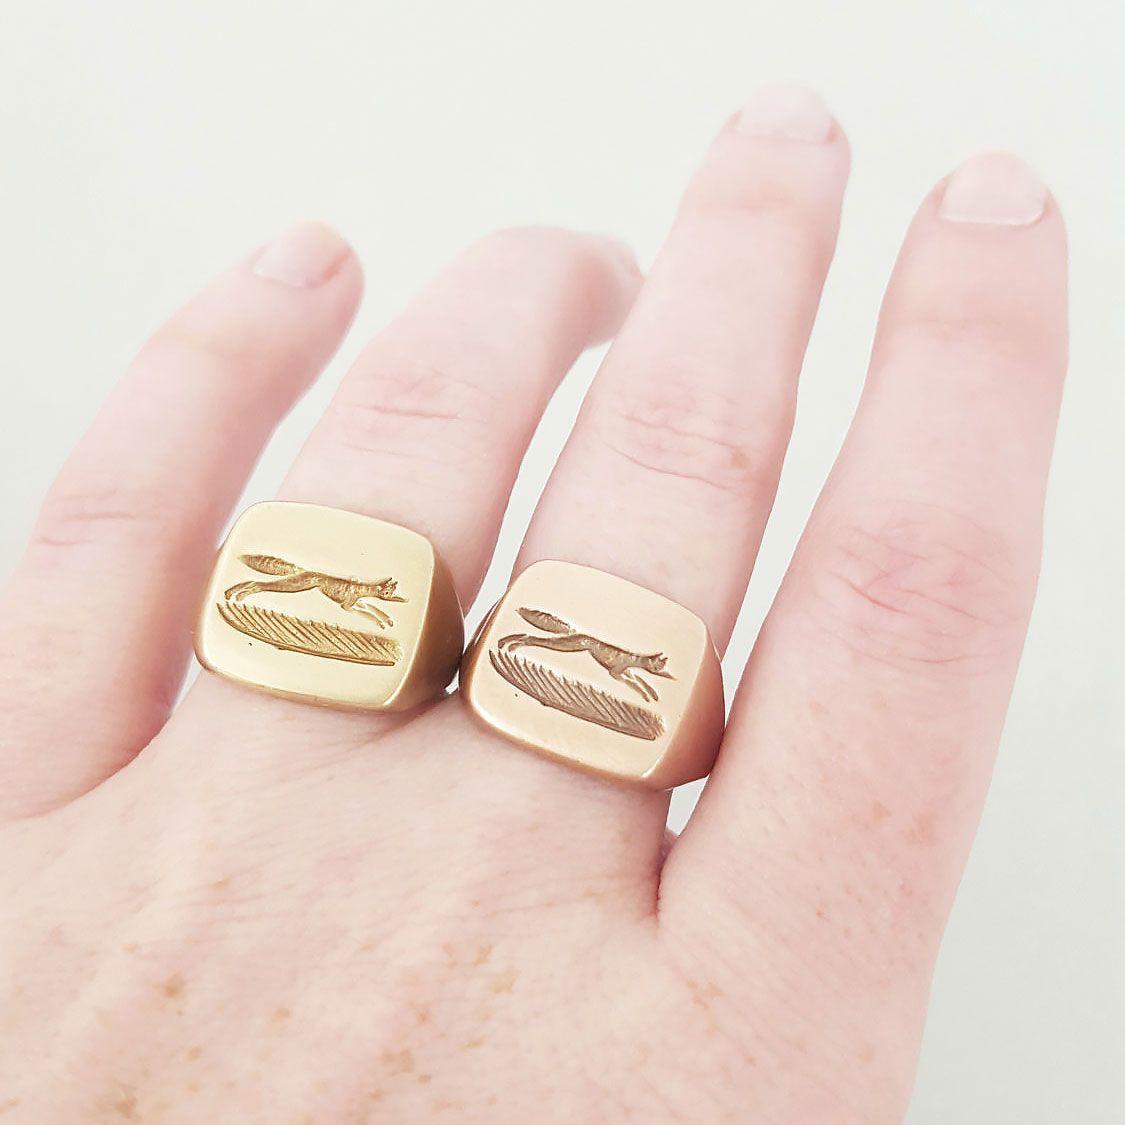 Badass Rings | accesories | Pinterest | Ring, Badass and Fox ring